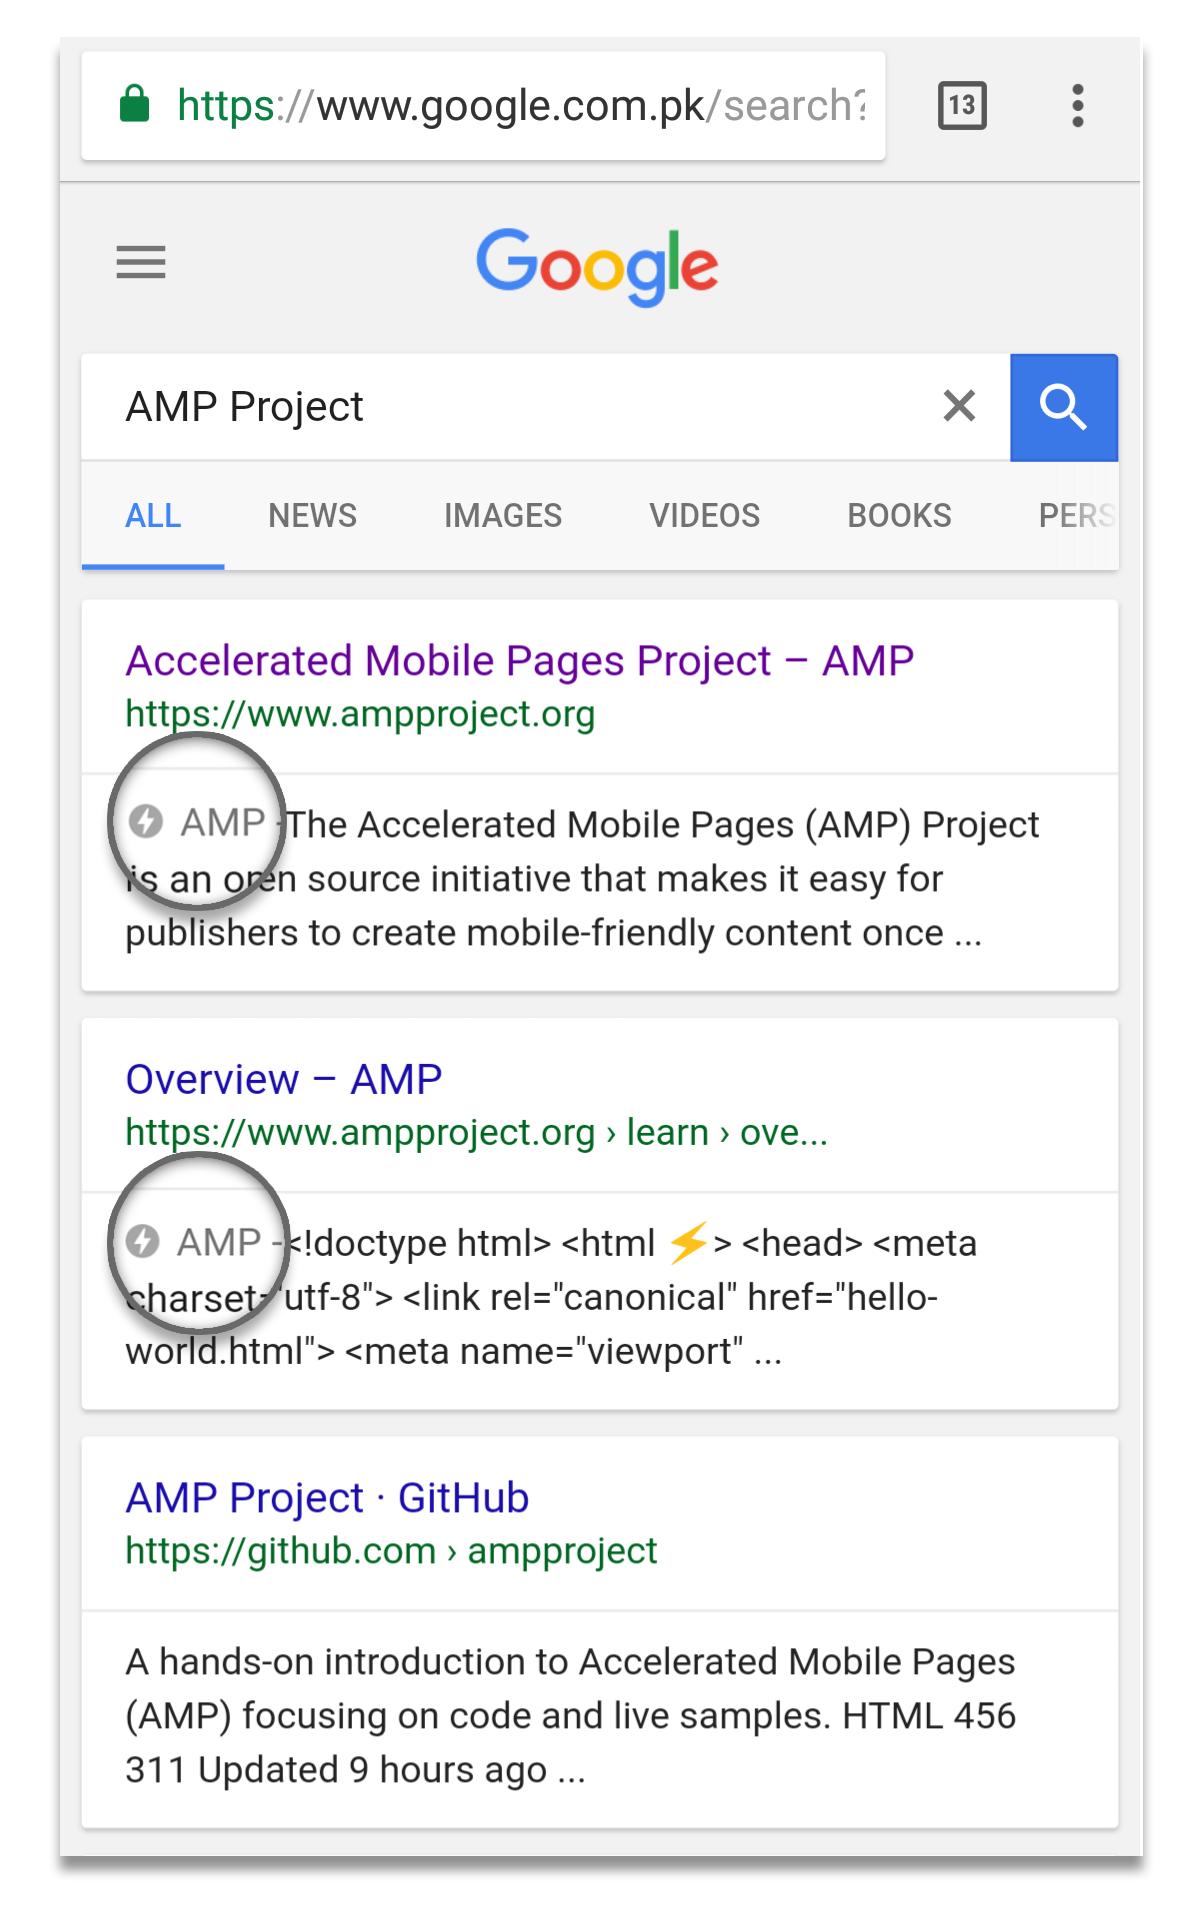 cover1 kamyabscript.ir  - افزونه AMPforWP افزایش سرعت سایت نسخه 9.3.6